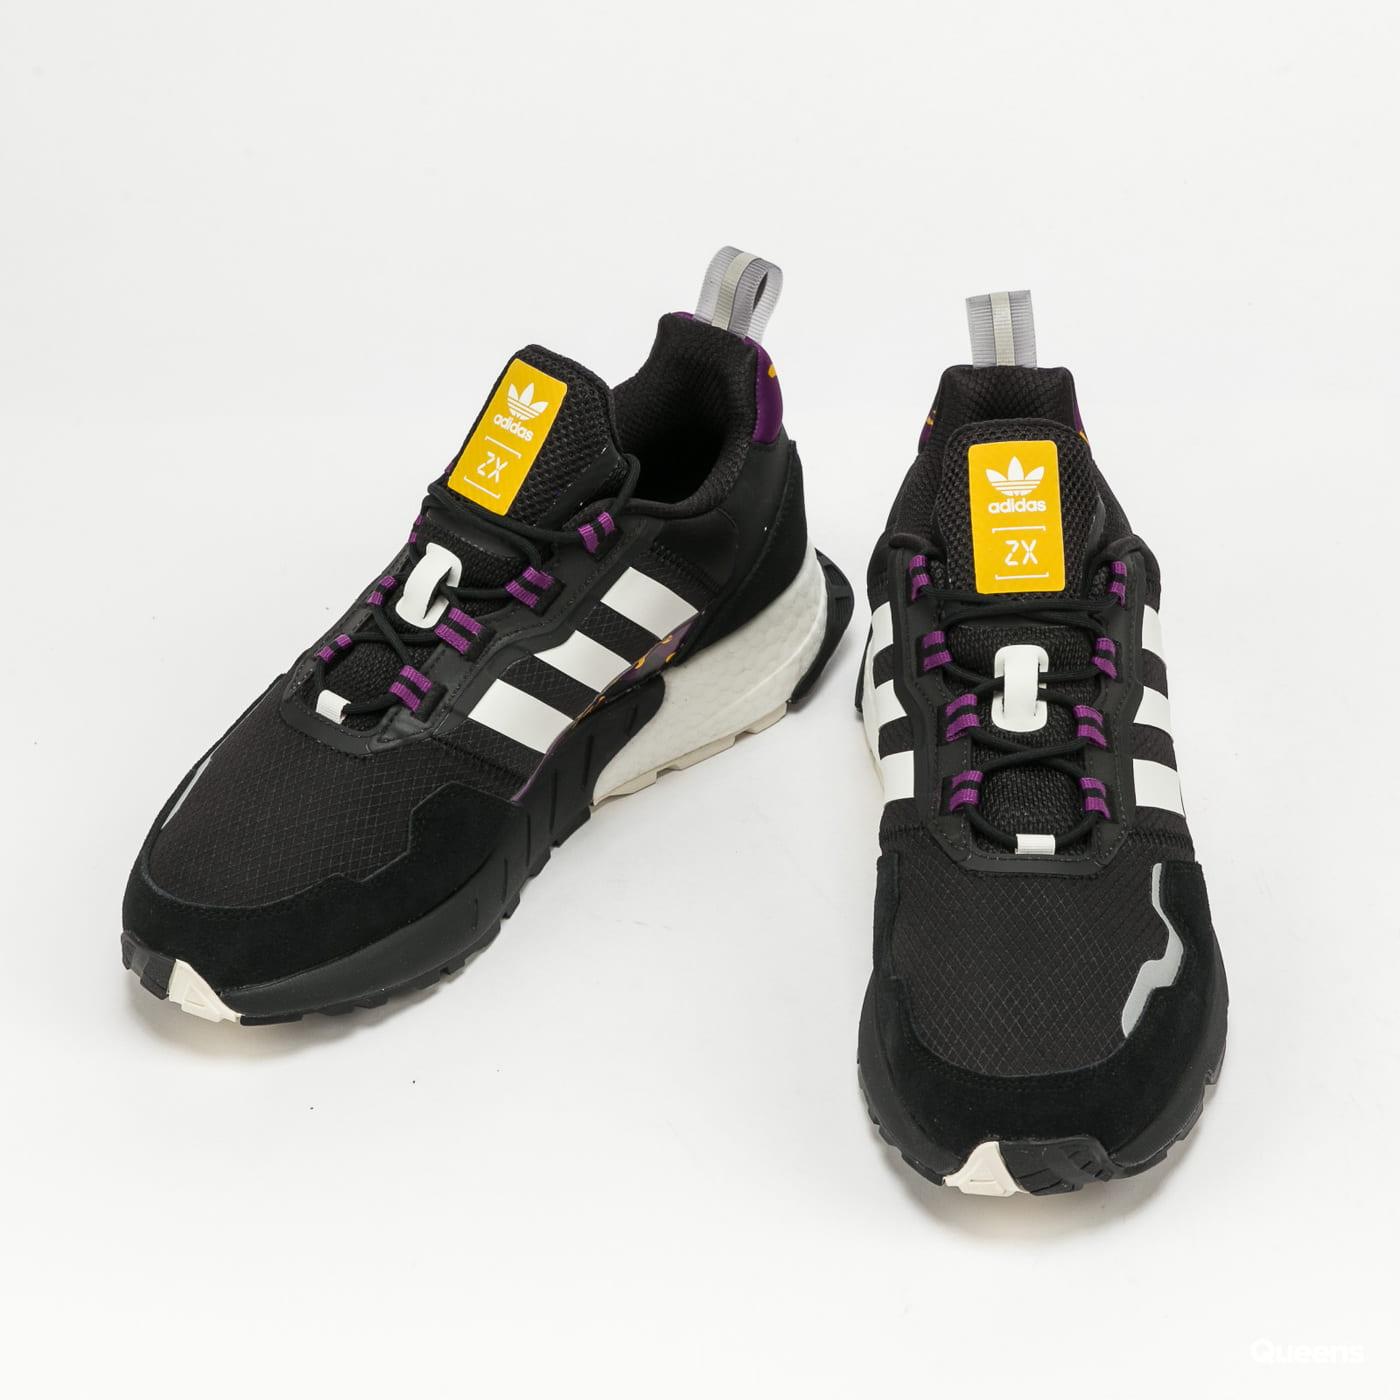 adidas Originals ZX 1K Boost - Seasonality core black / cloud white / glory purple